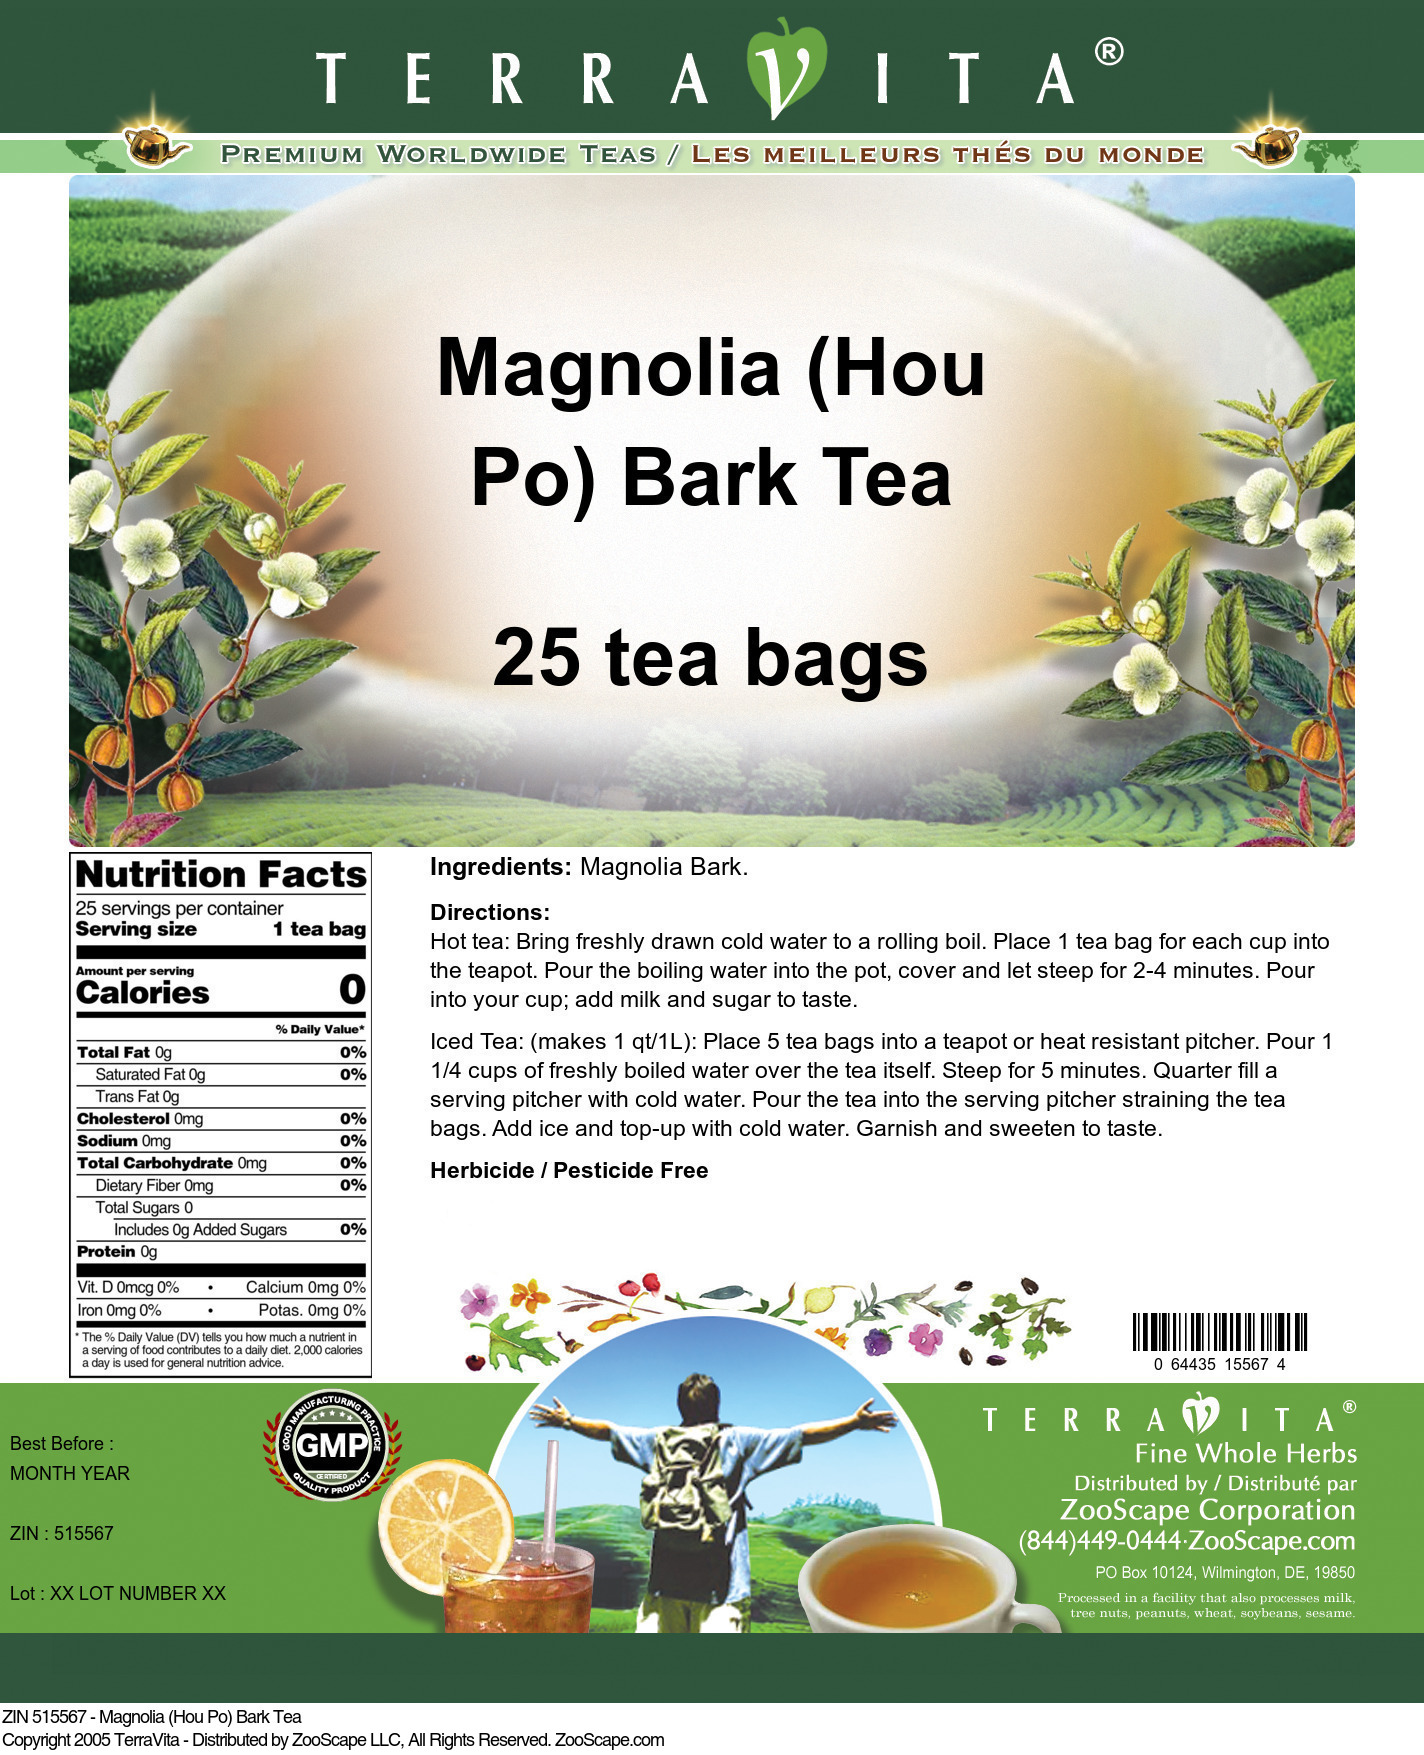 Magnolia (Hou Po) Bark Tea